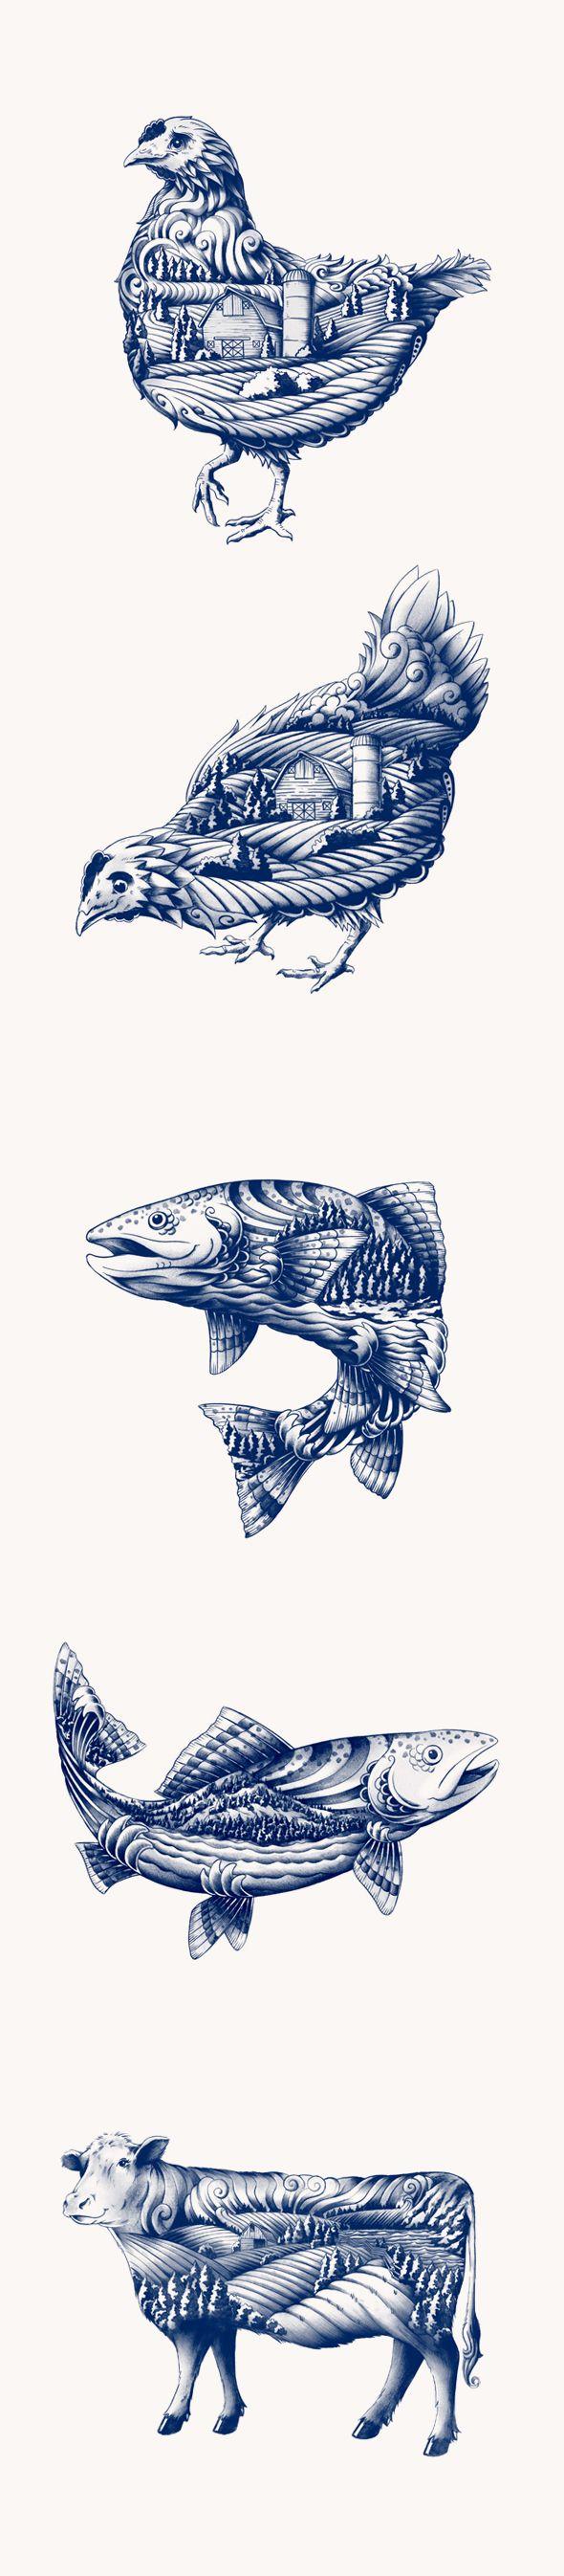 96 best illustration images on pinterest animal logo graph design blue goose izmirmasajfo